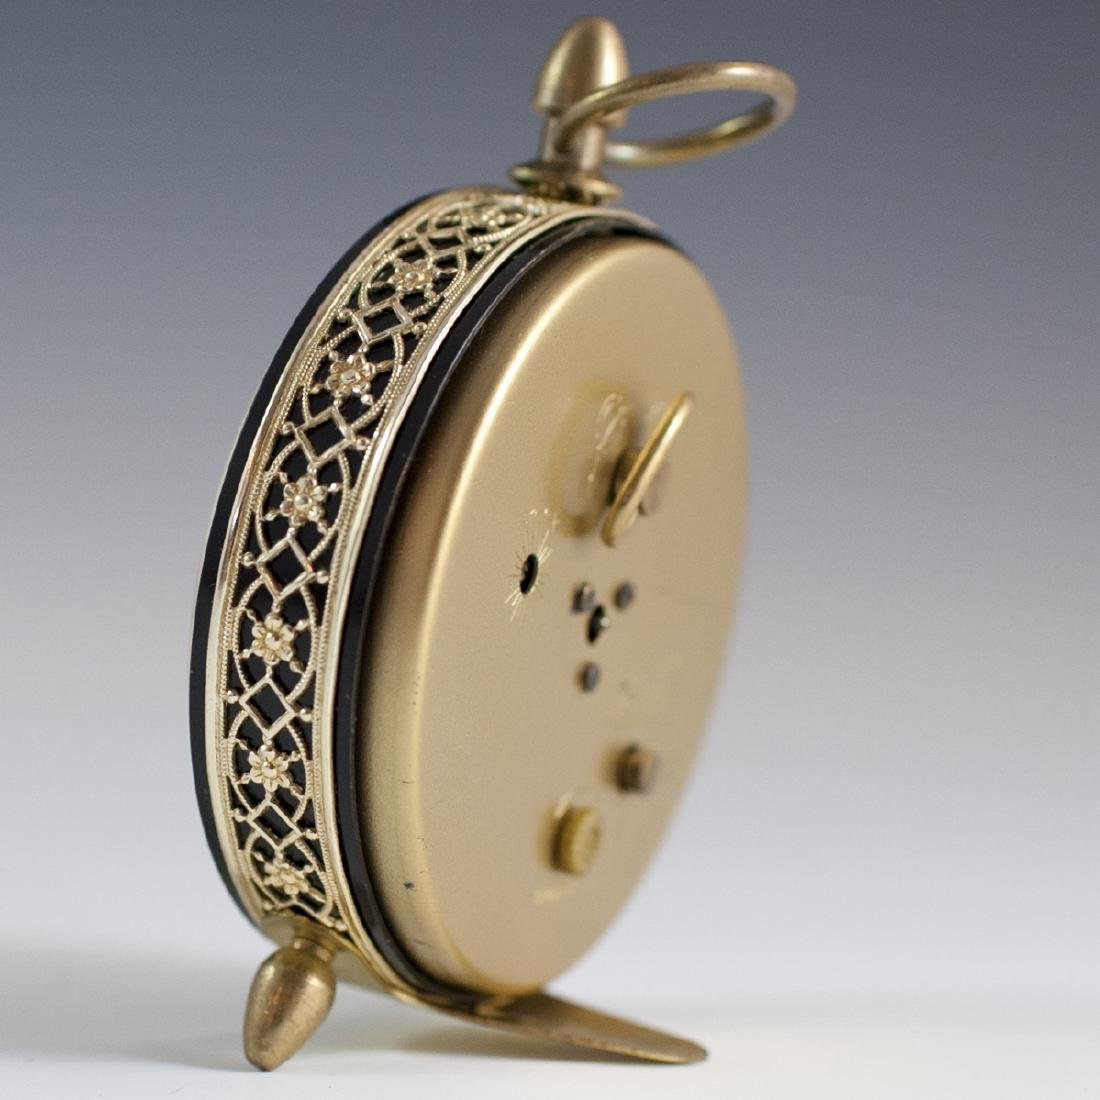 Bulova Mother of Pearl Alarm Clock - 2